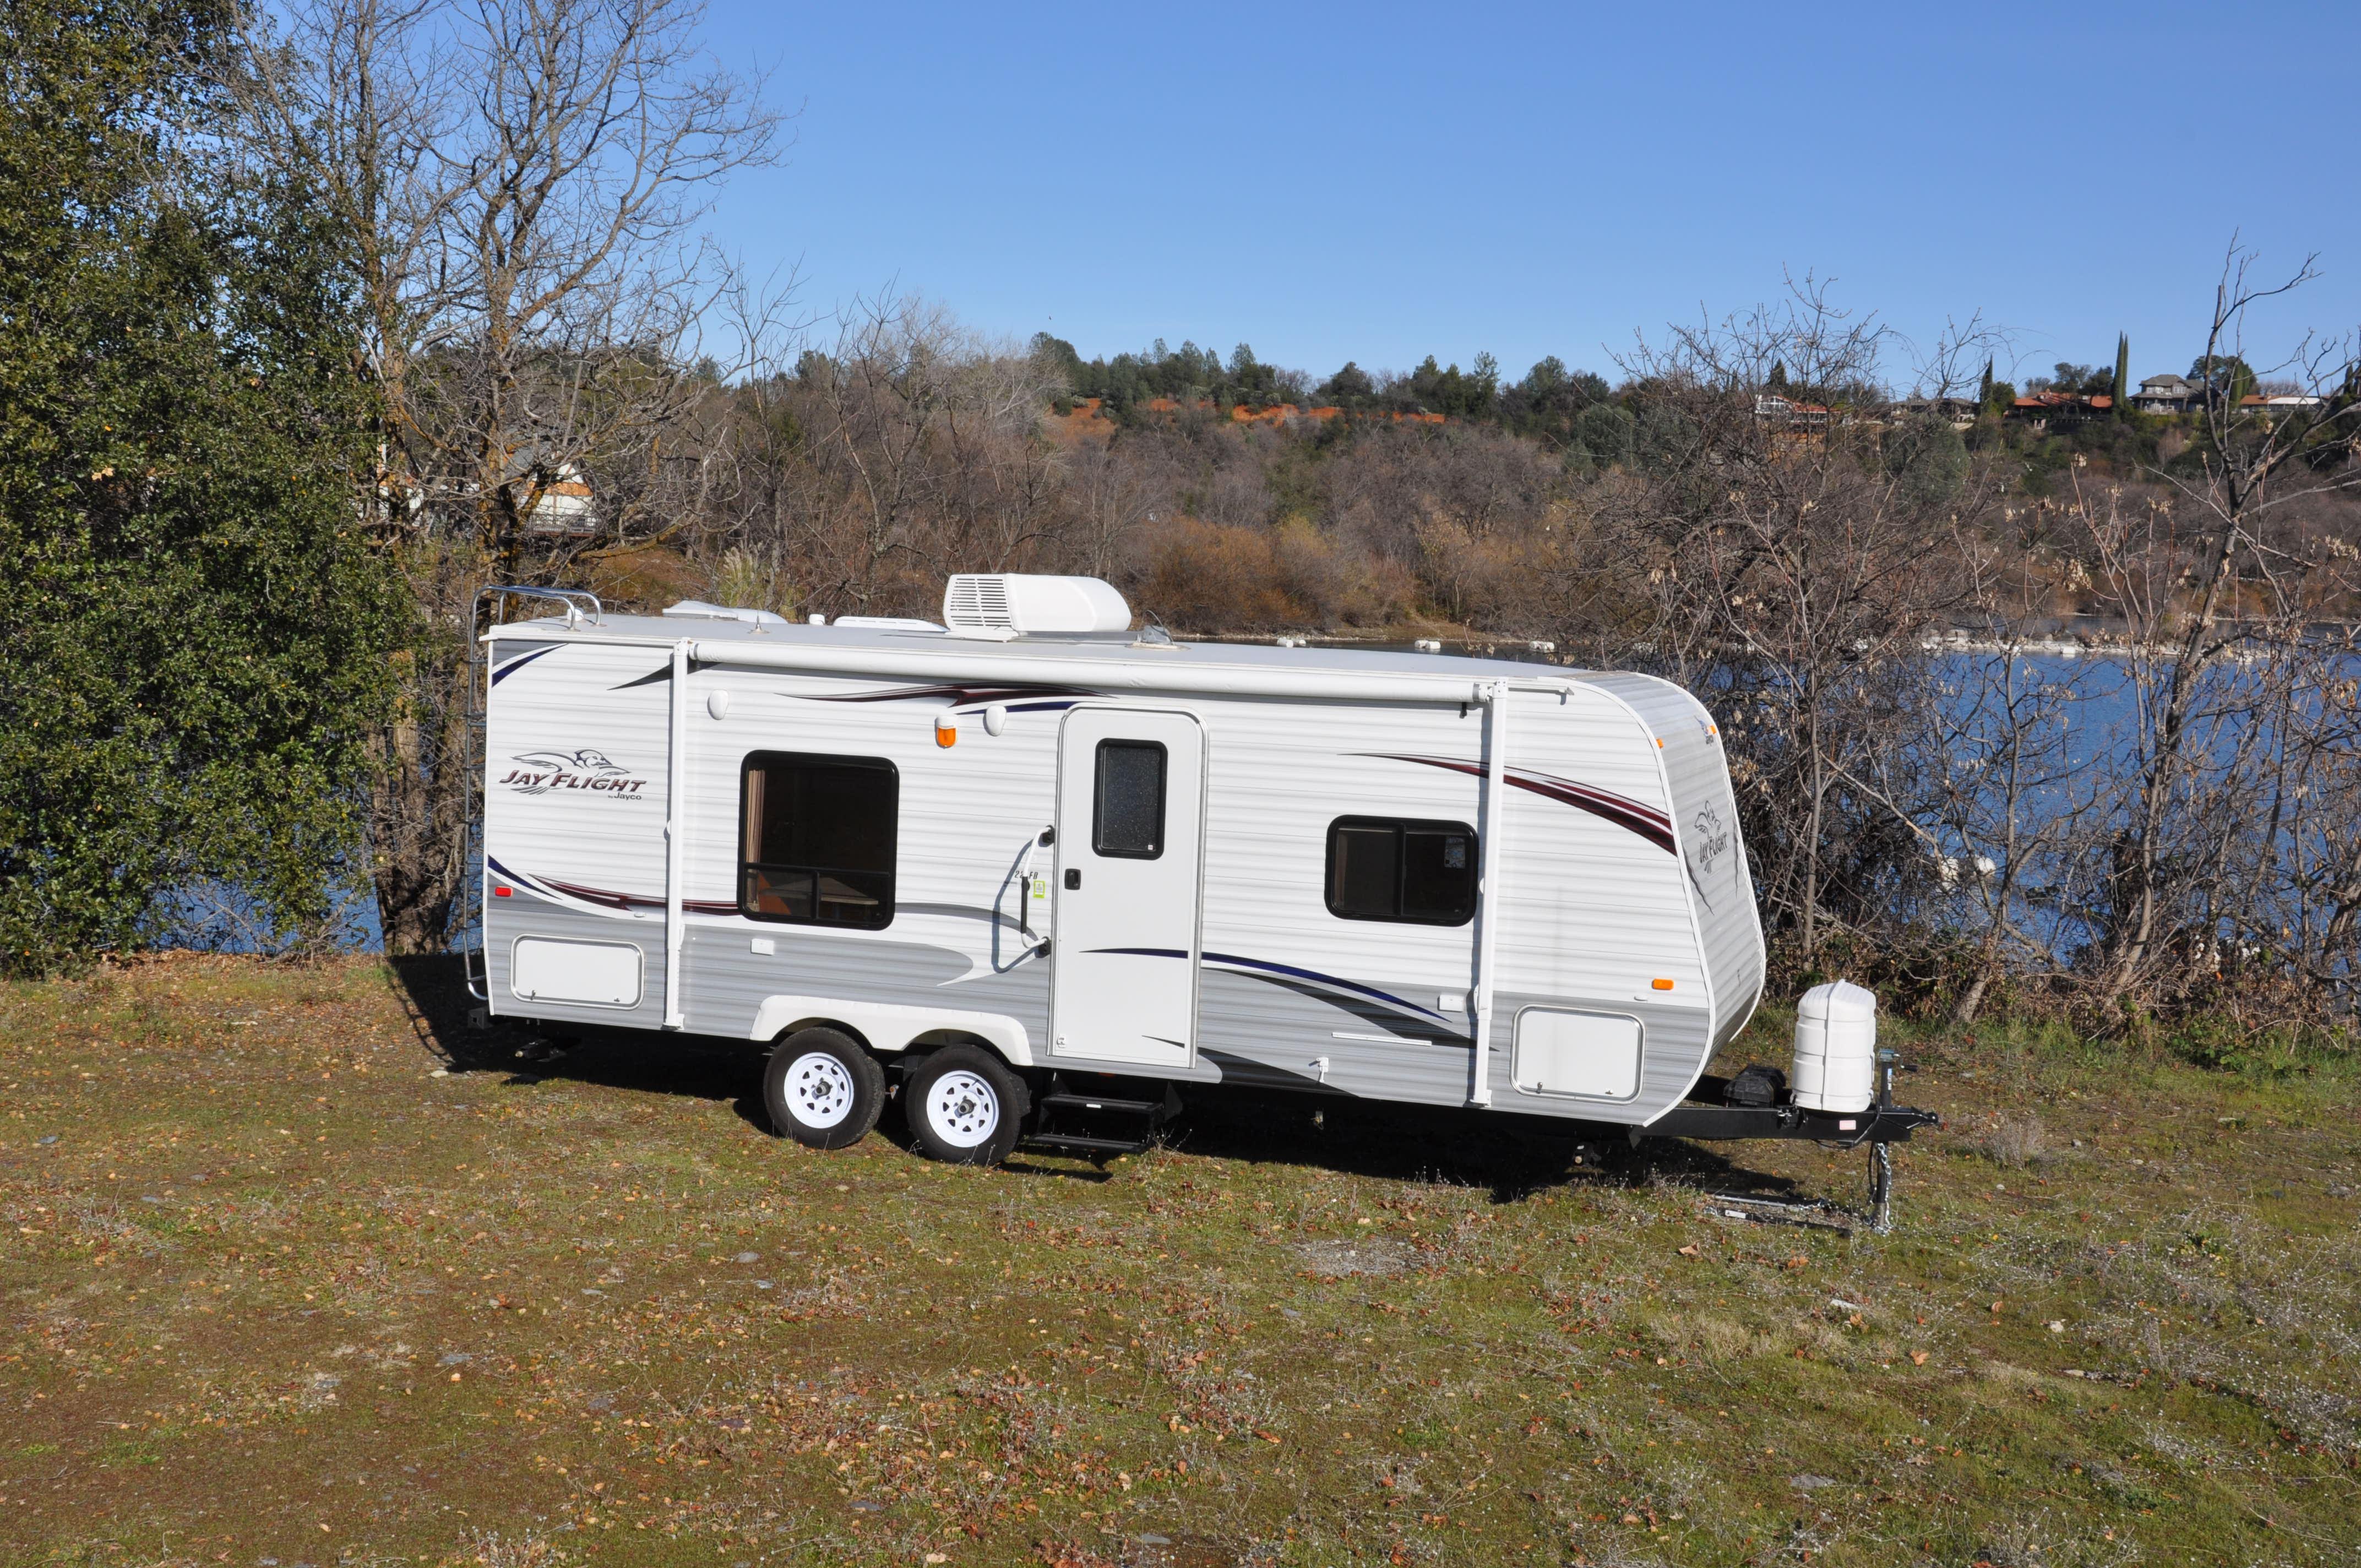 trailer-rentals-redding-california-towtally-camping-towtally-camping-4288x2848